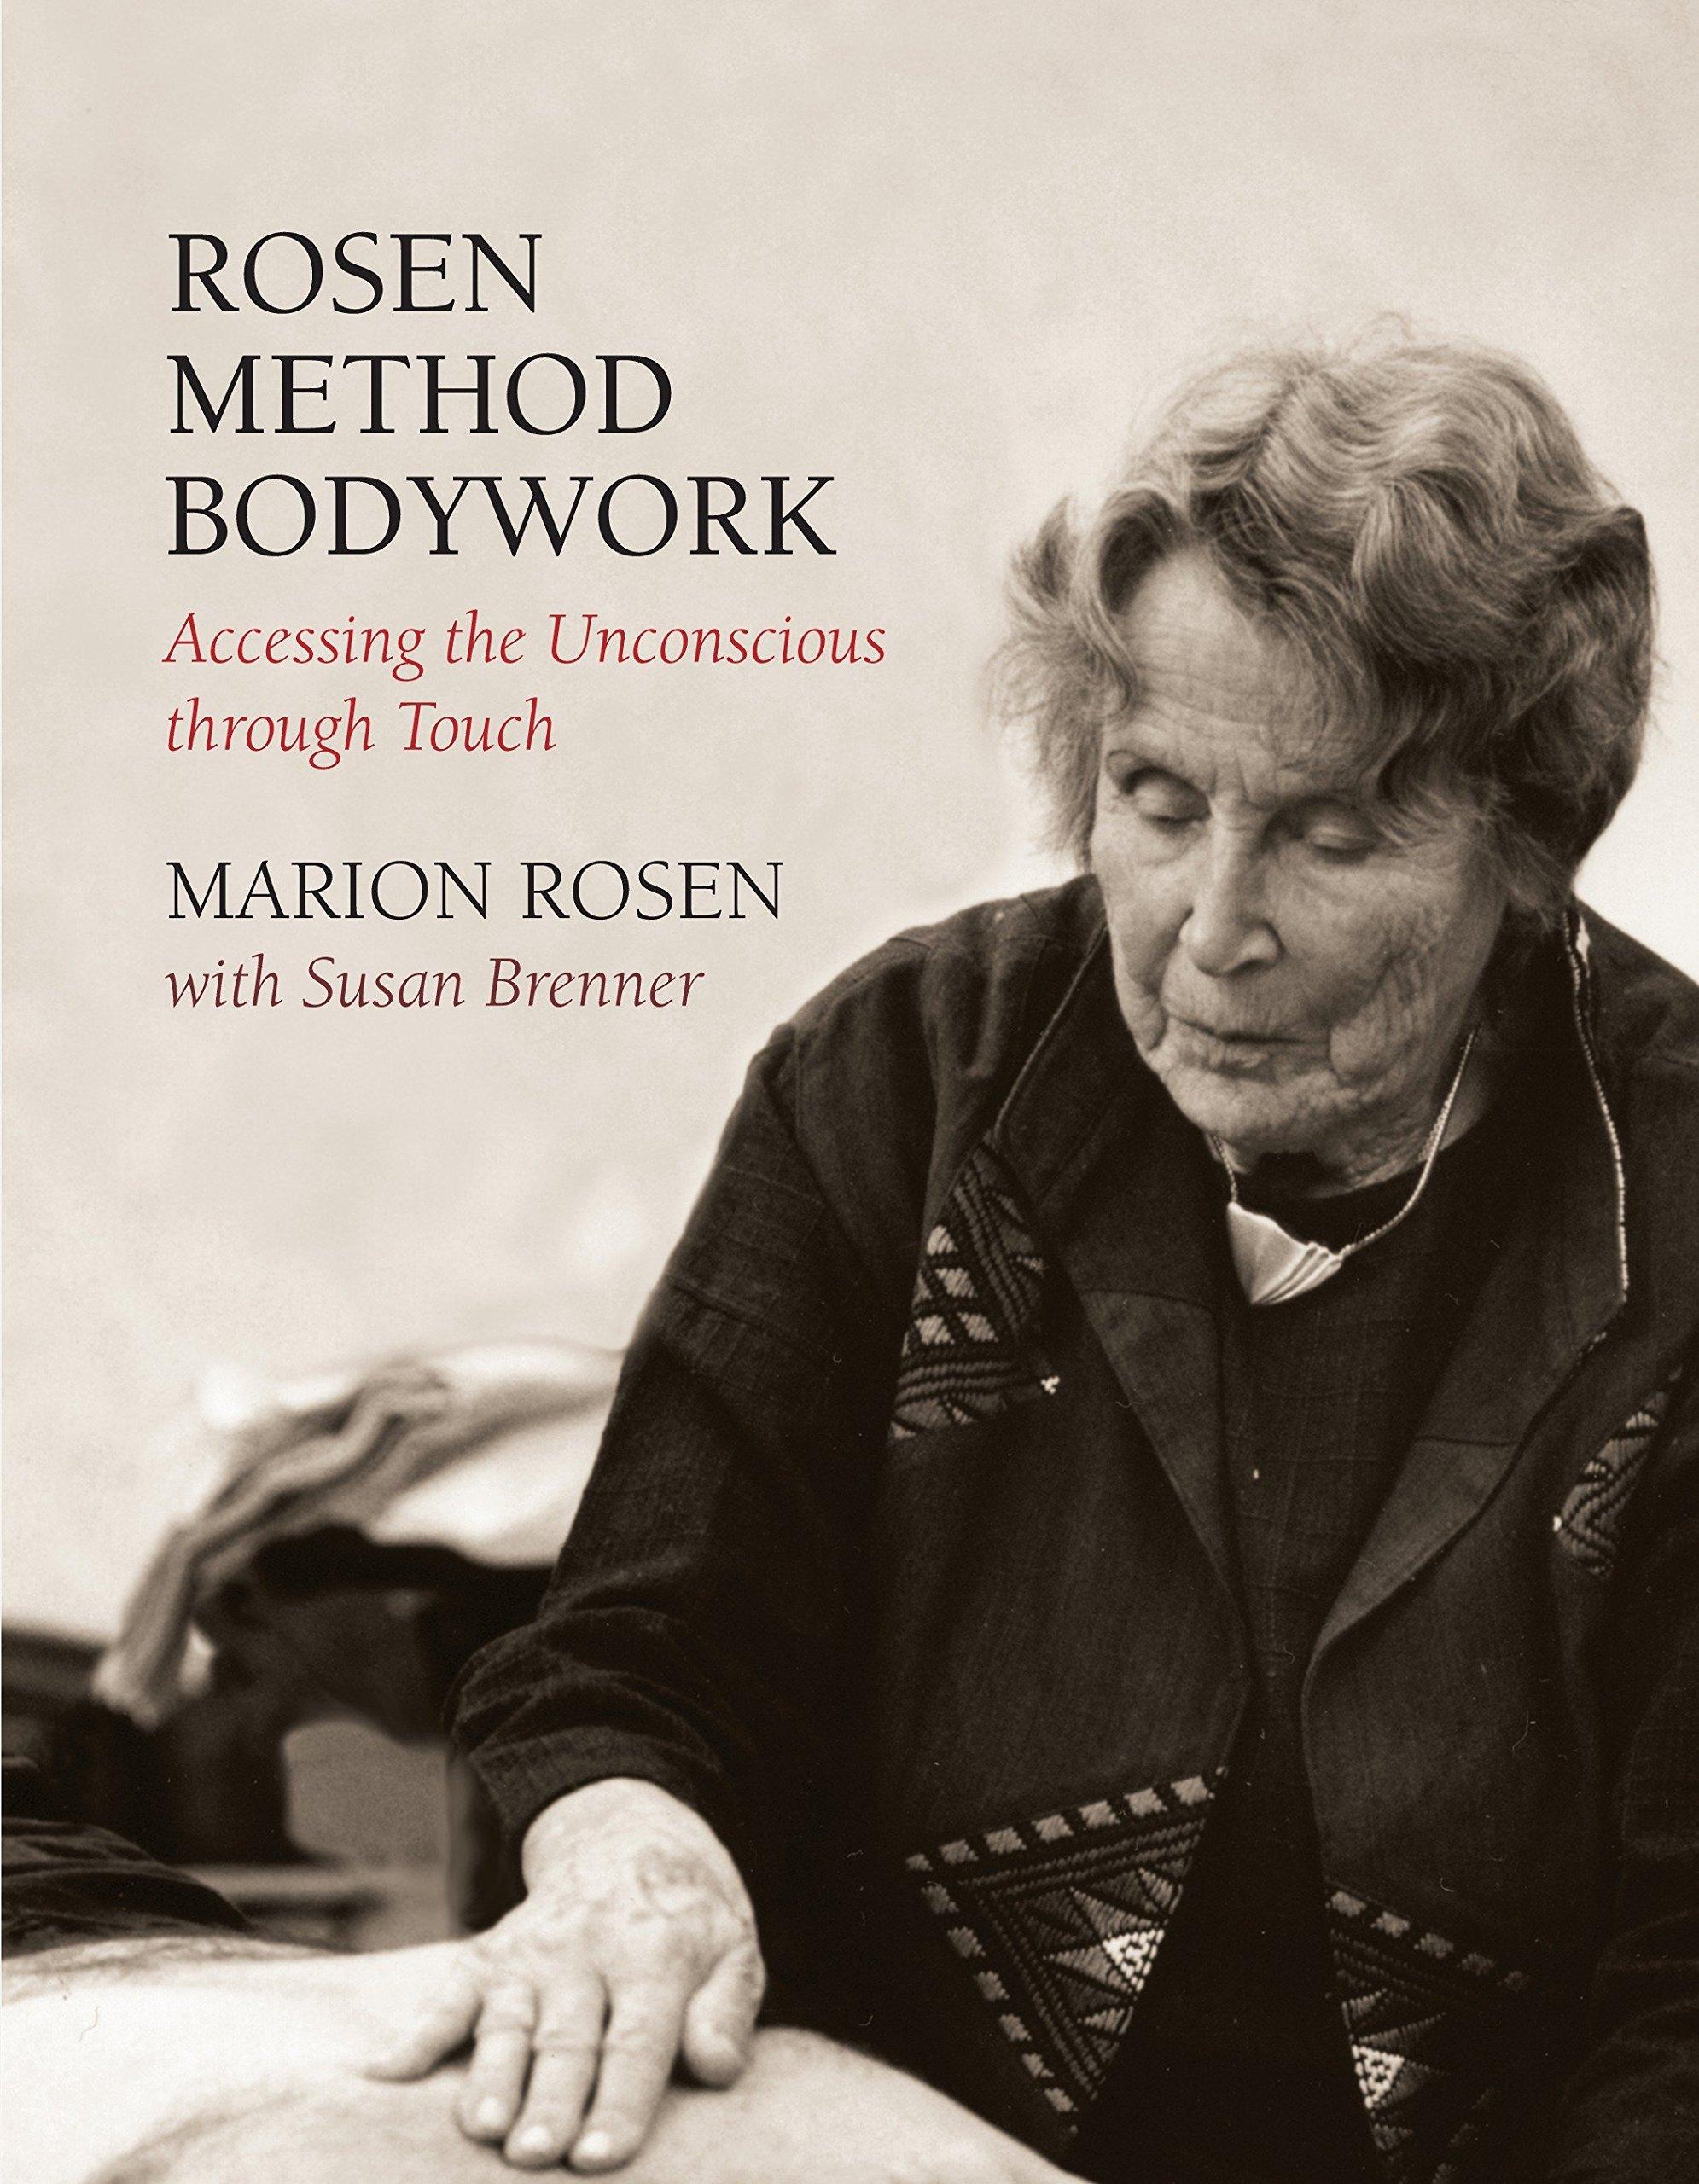 Rosen Method Bodywork: Accessing the Unconscious through Touch ebook